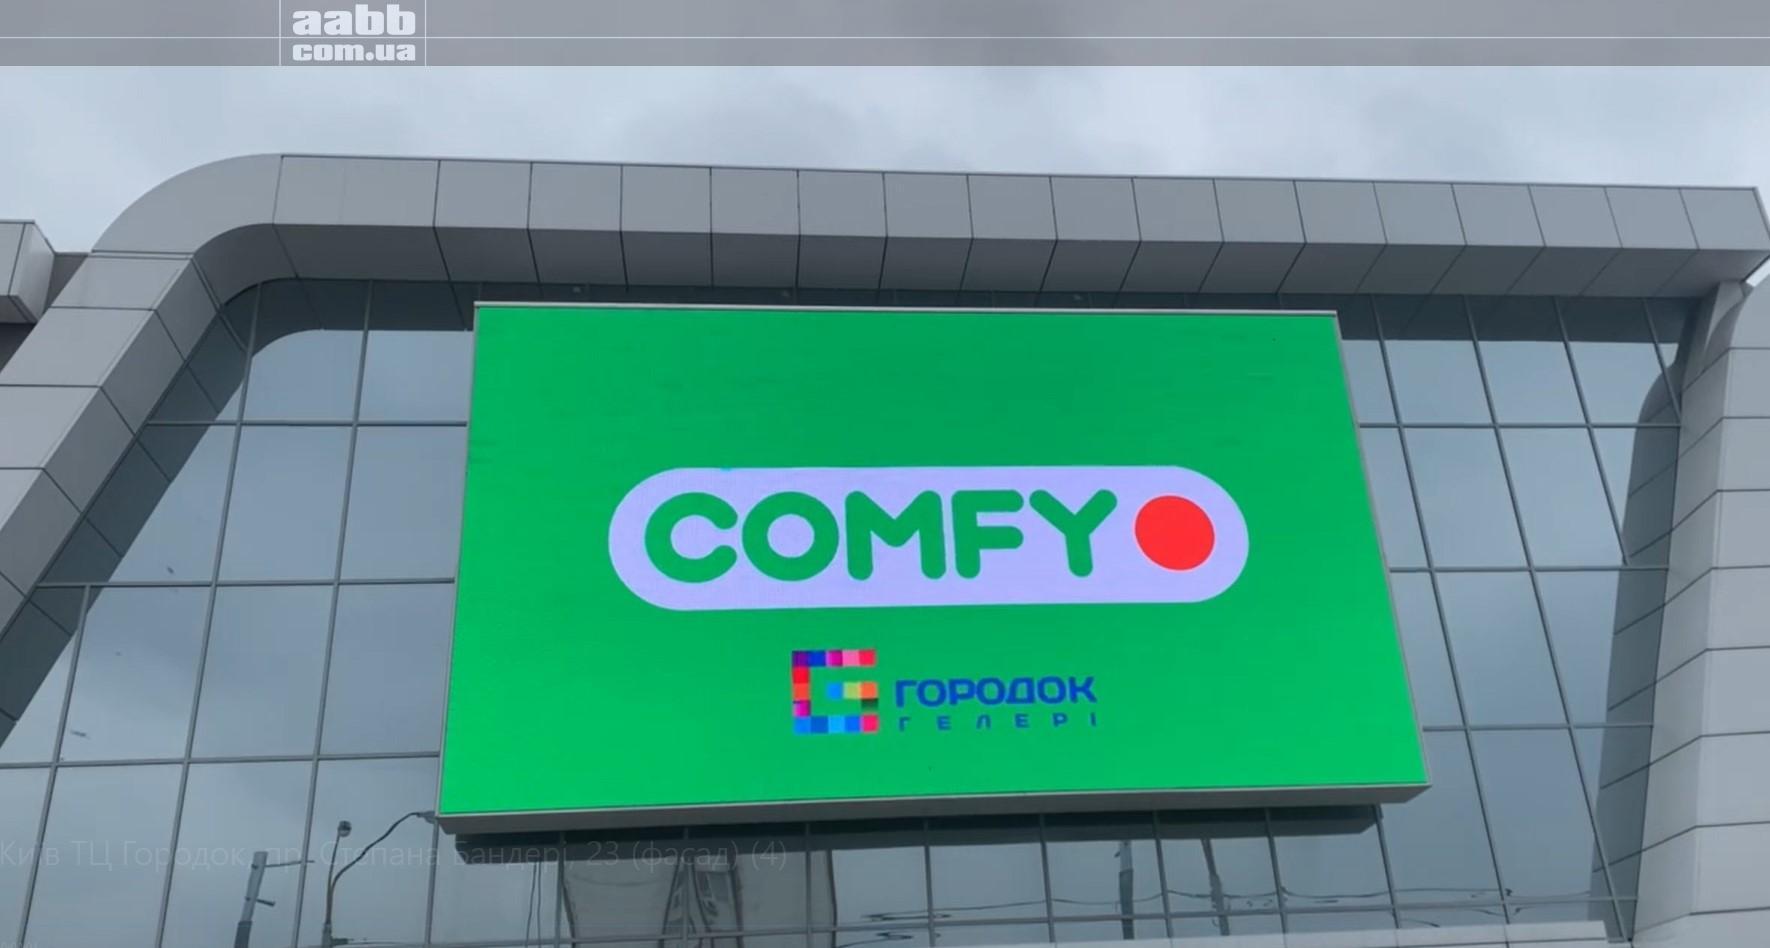 Реклама на медіафасадах ТЦ Godorok (квітень 2021)